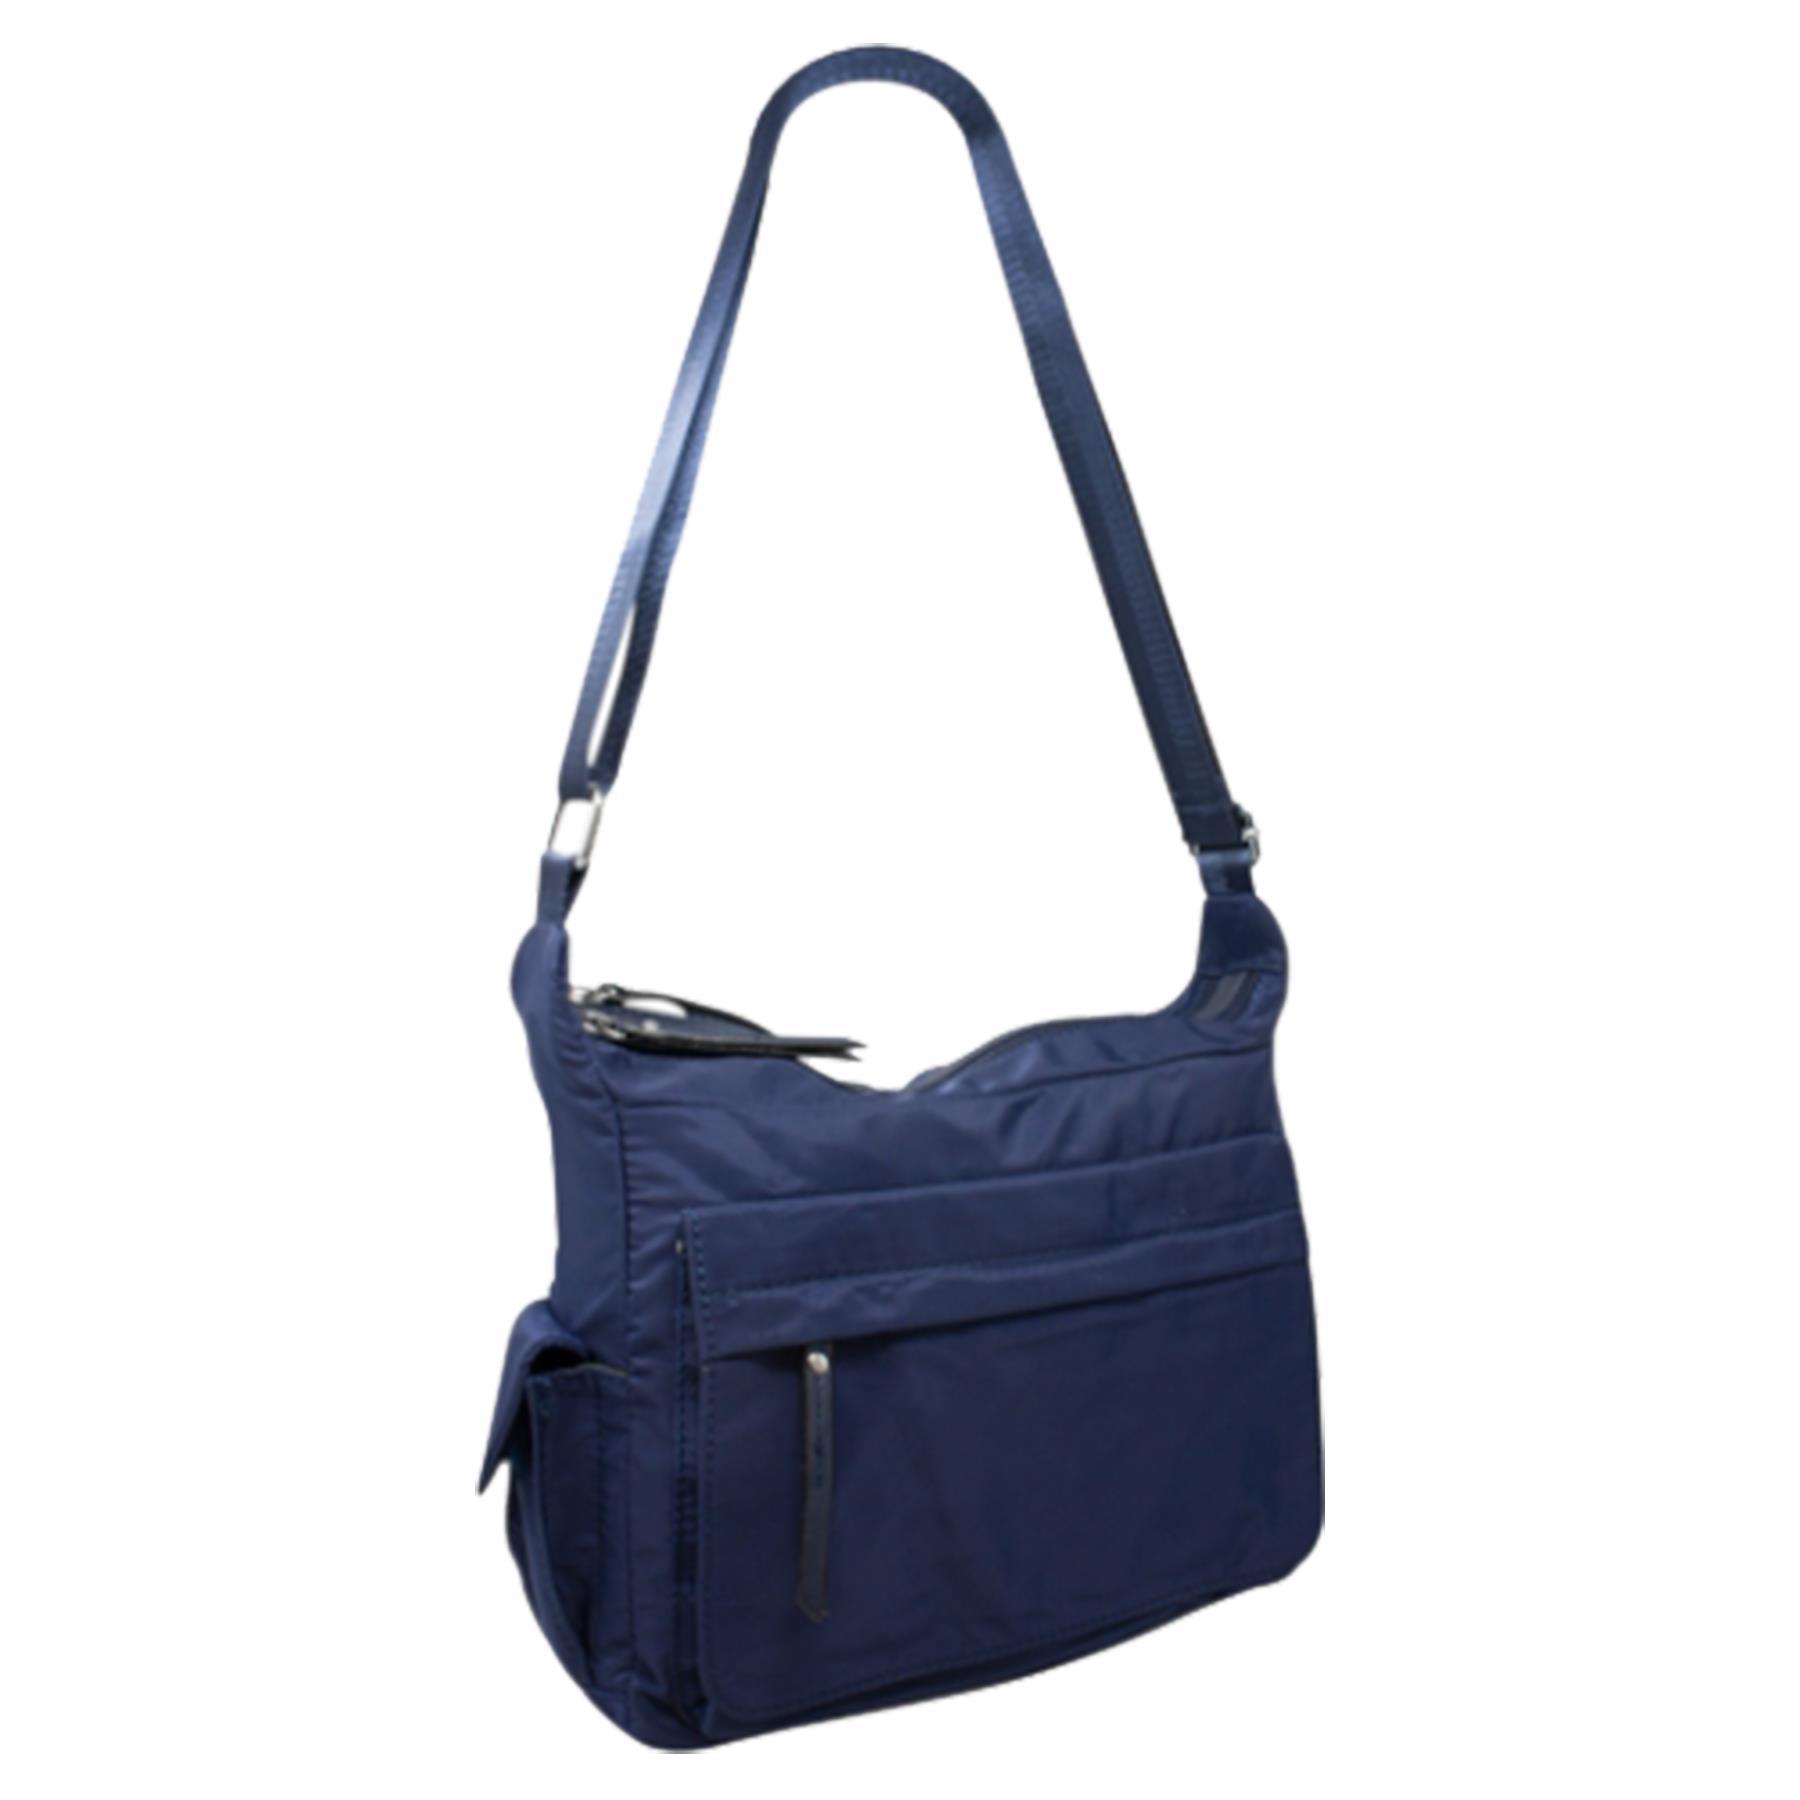 New-Ladies-Men-s-Showerproof-School-College-Practical-Basic-Crossbody-Bag thumbnail 10